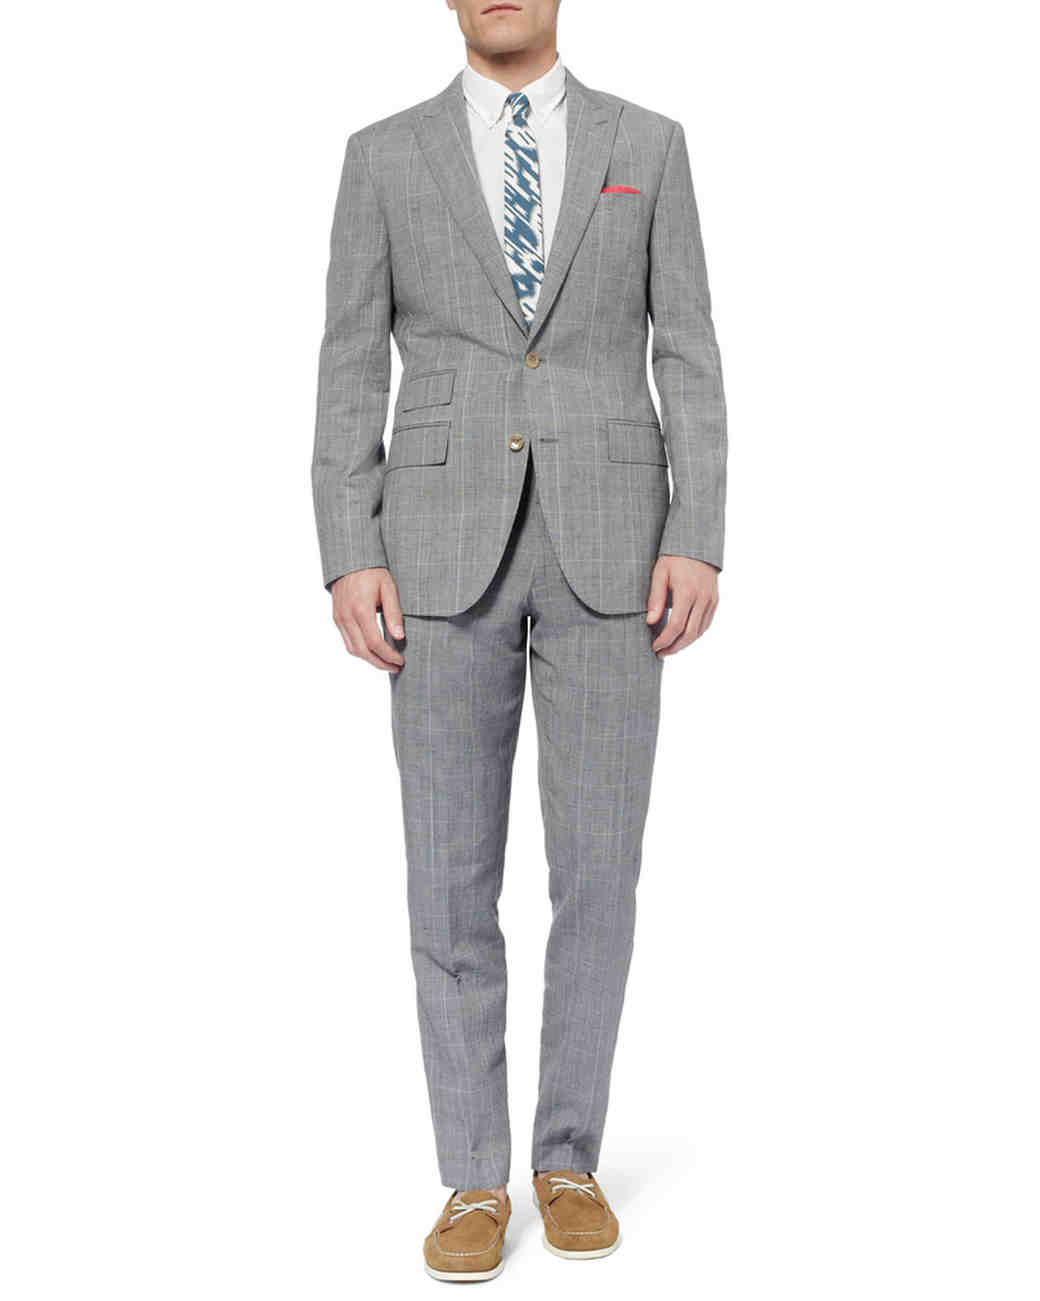 fall-groom-suits-mr-porter-jcrew-prince-of-wales-1014.jpg